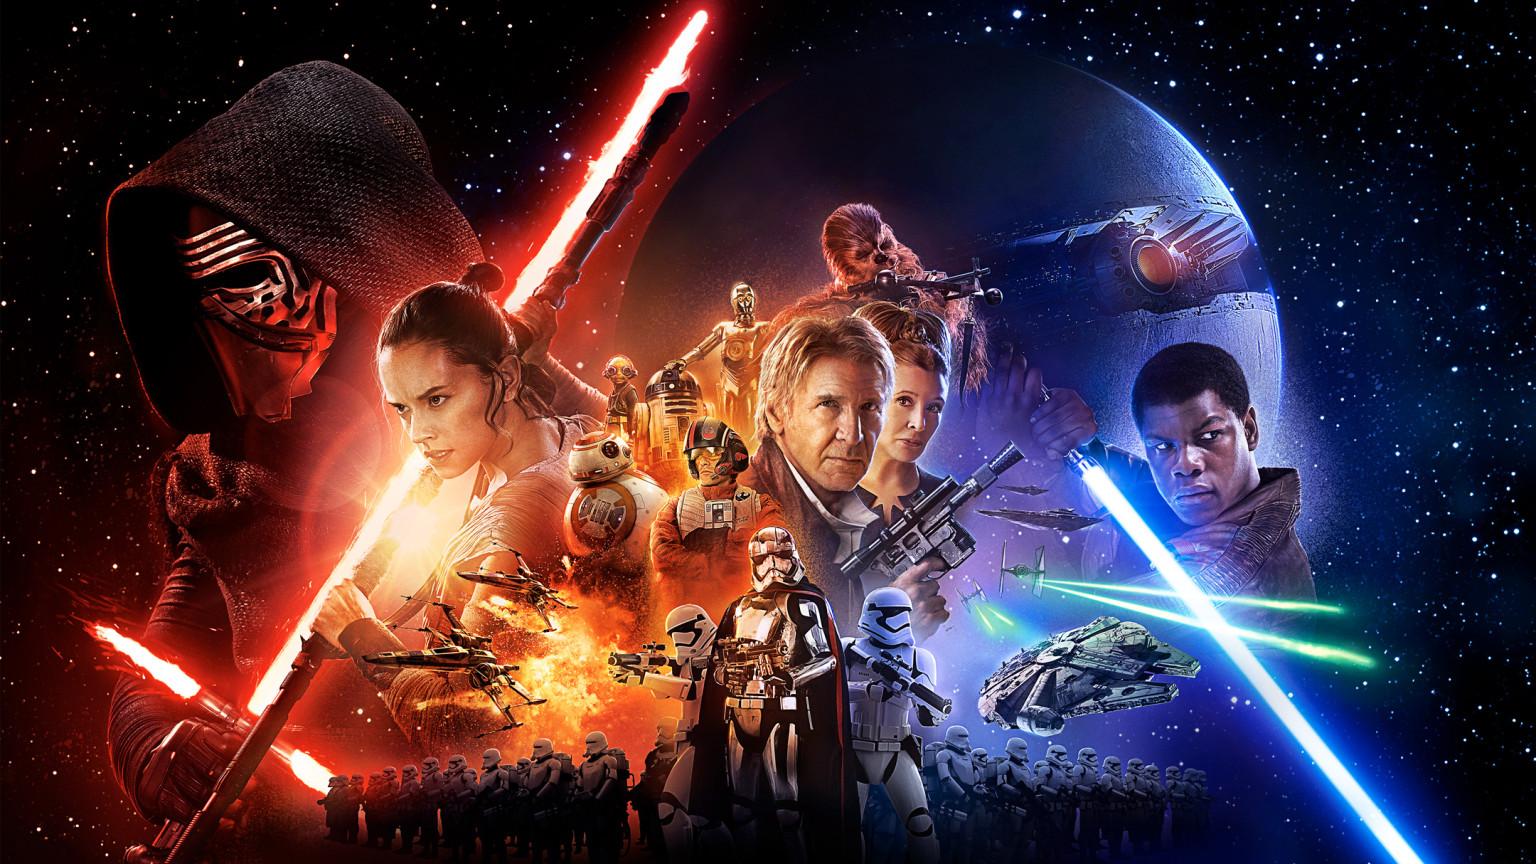 tfa_poster_wide_header-1536x864-959818851016